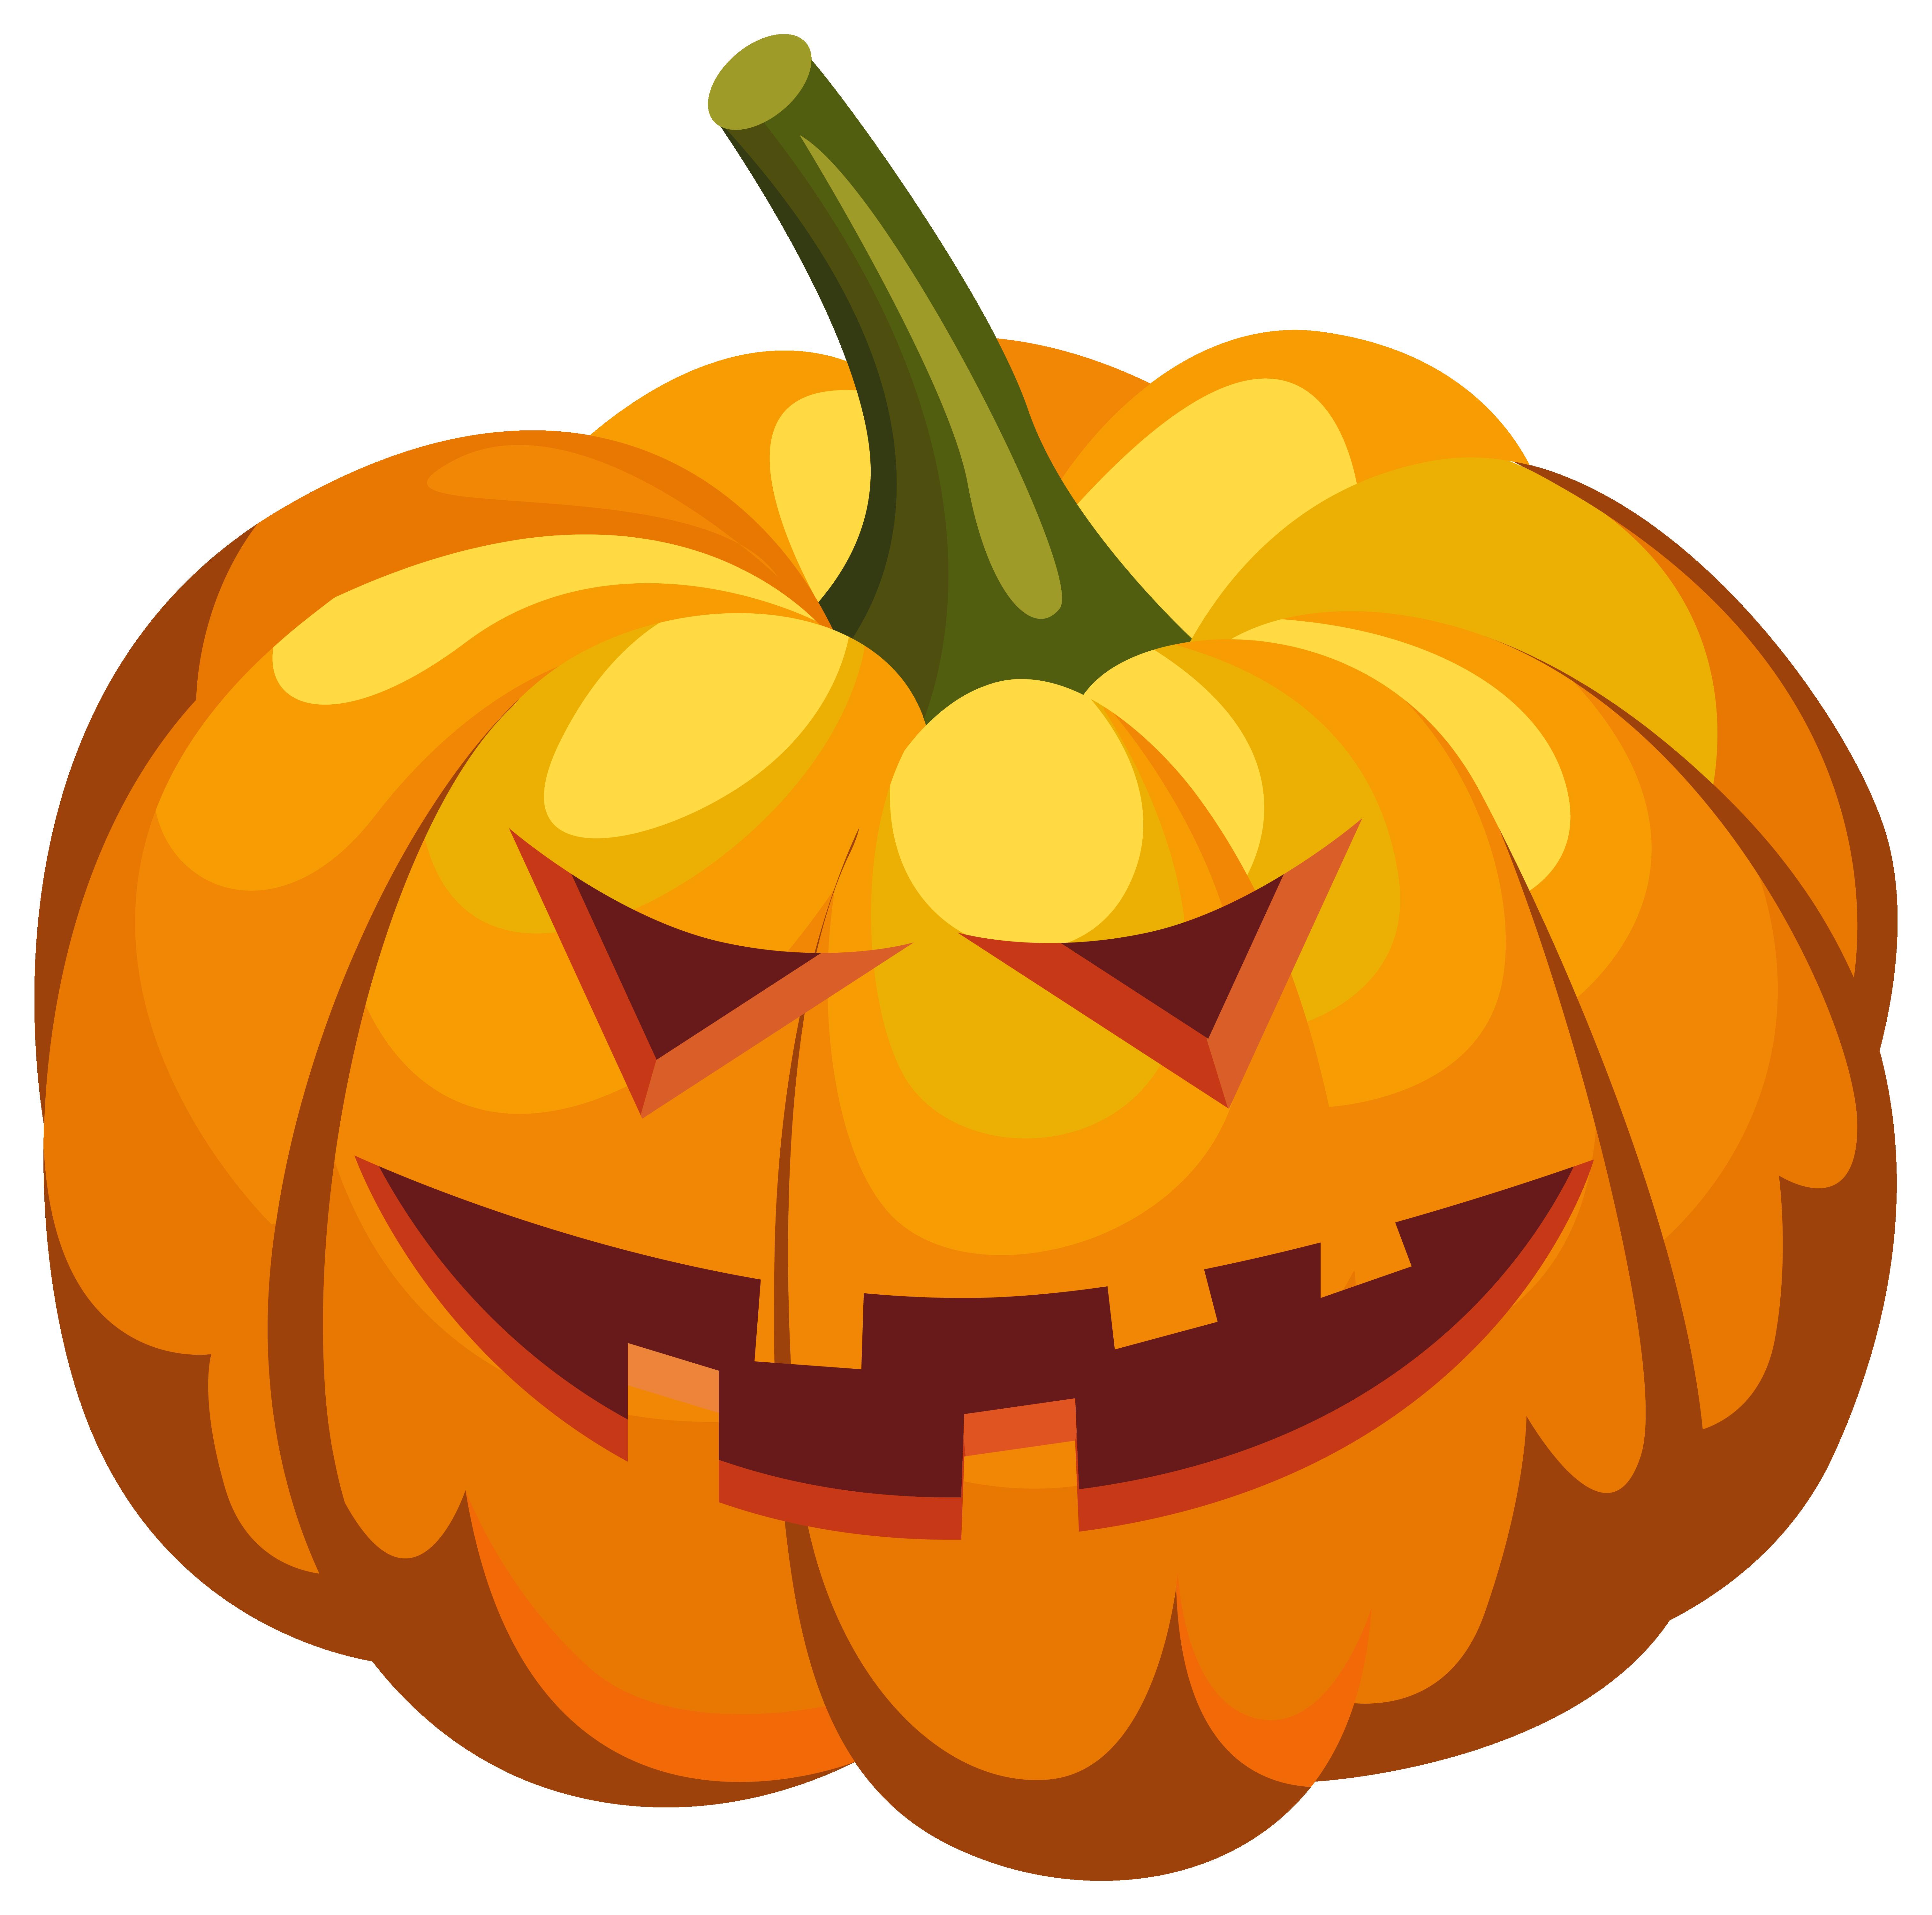 Pumpkin jack o lantern. Jackolantern clipart wolf